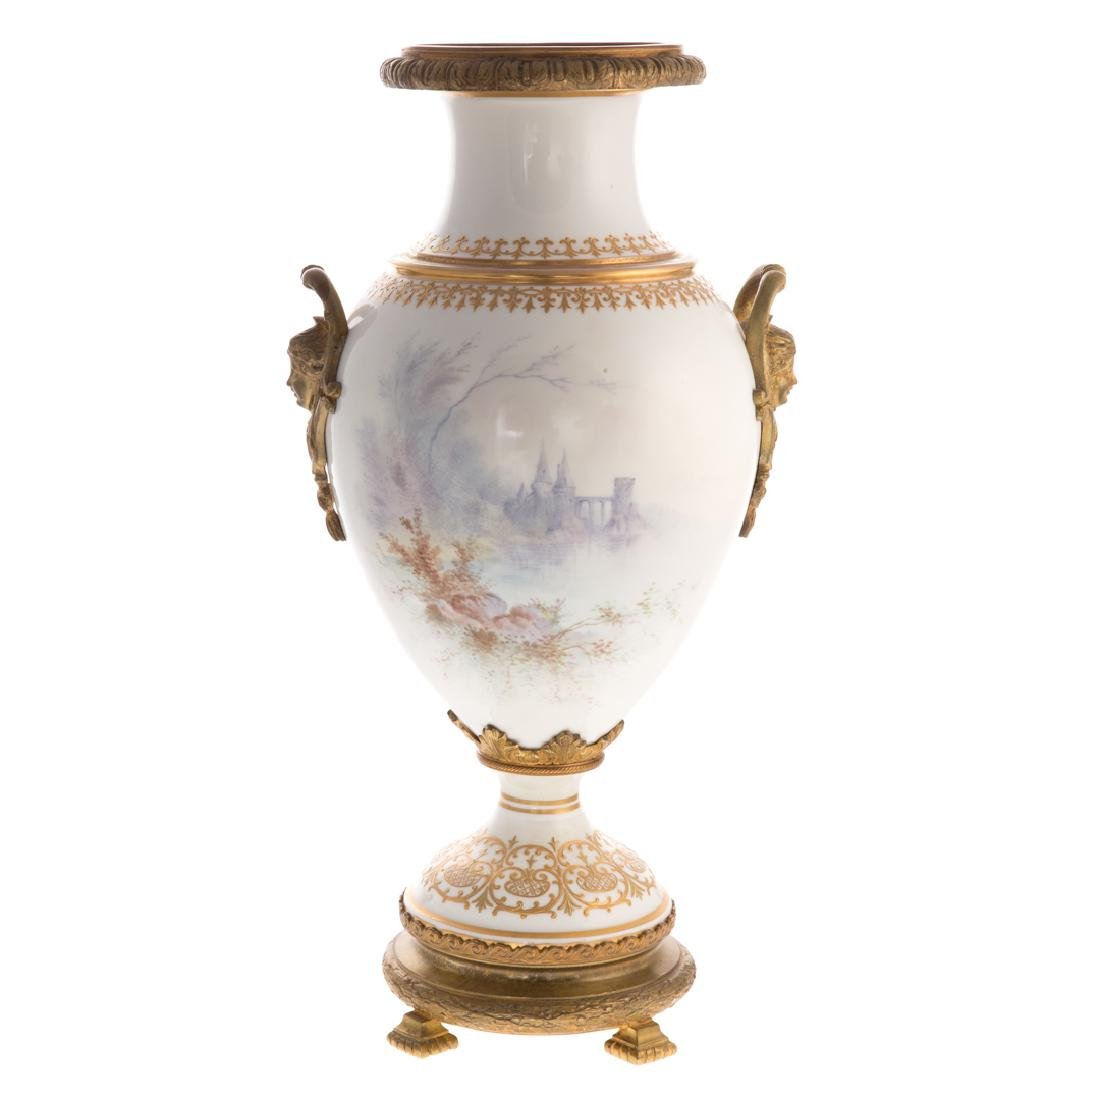 French Sevres style porcelain vase - 3